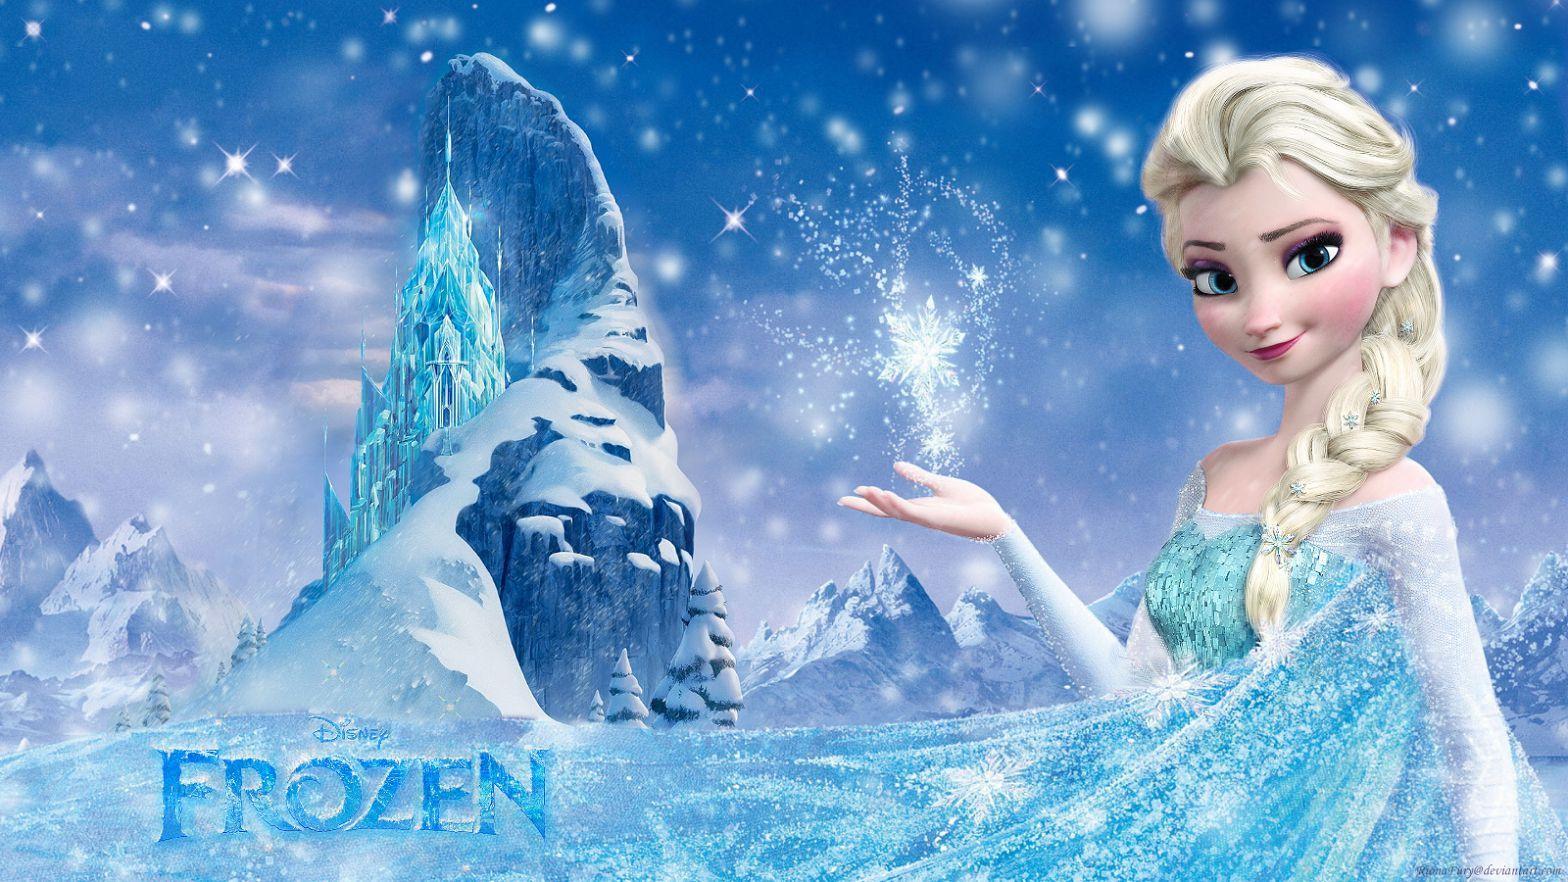 Frozen Wallpaper Hd Frozen Wallpaper Piano Disney Disney Frozen theme wallpaper hd